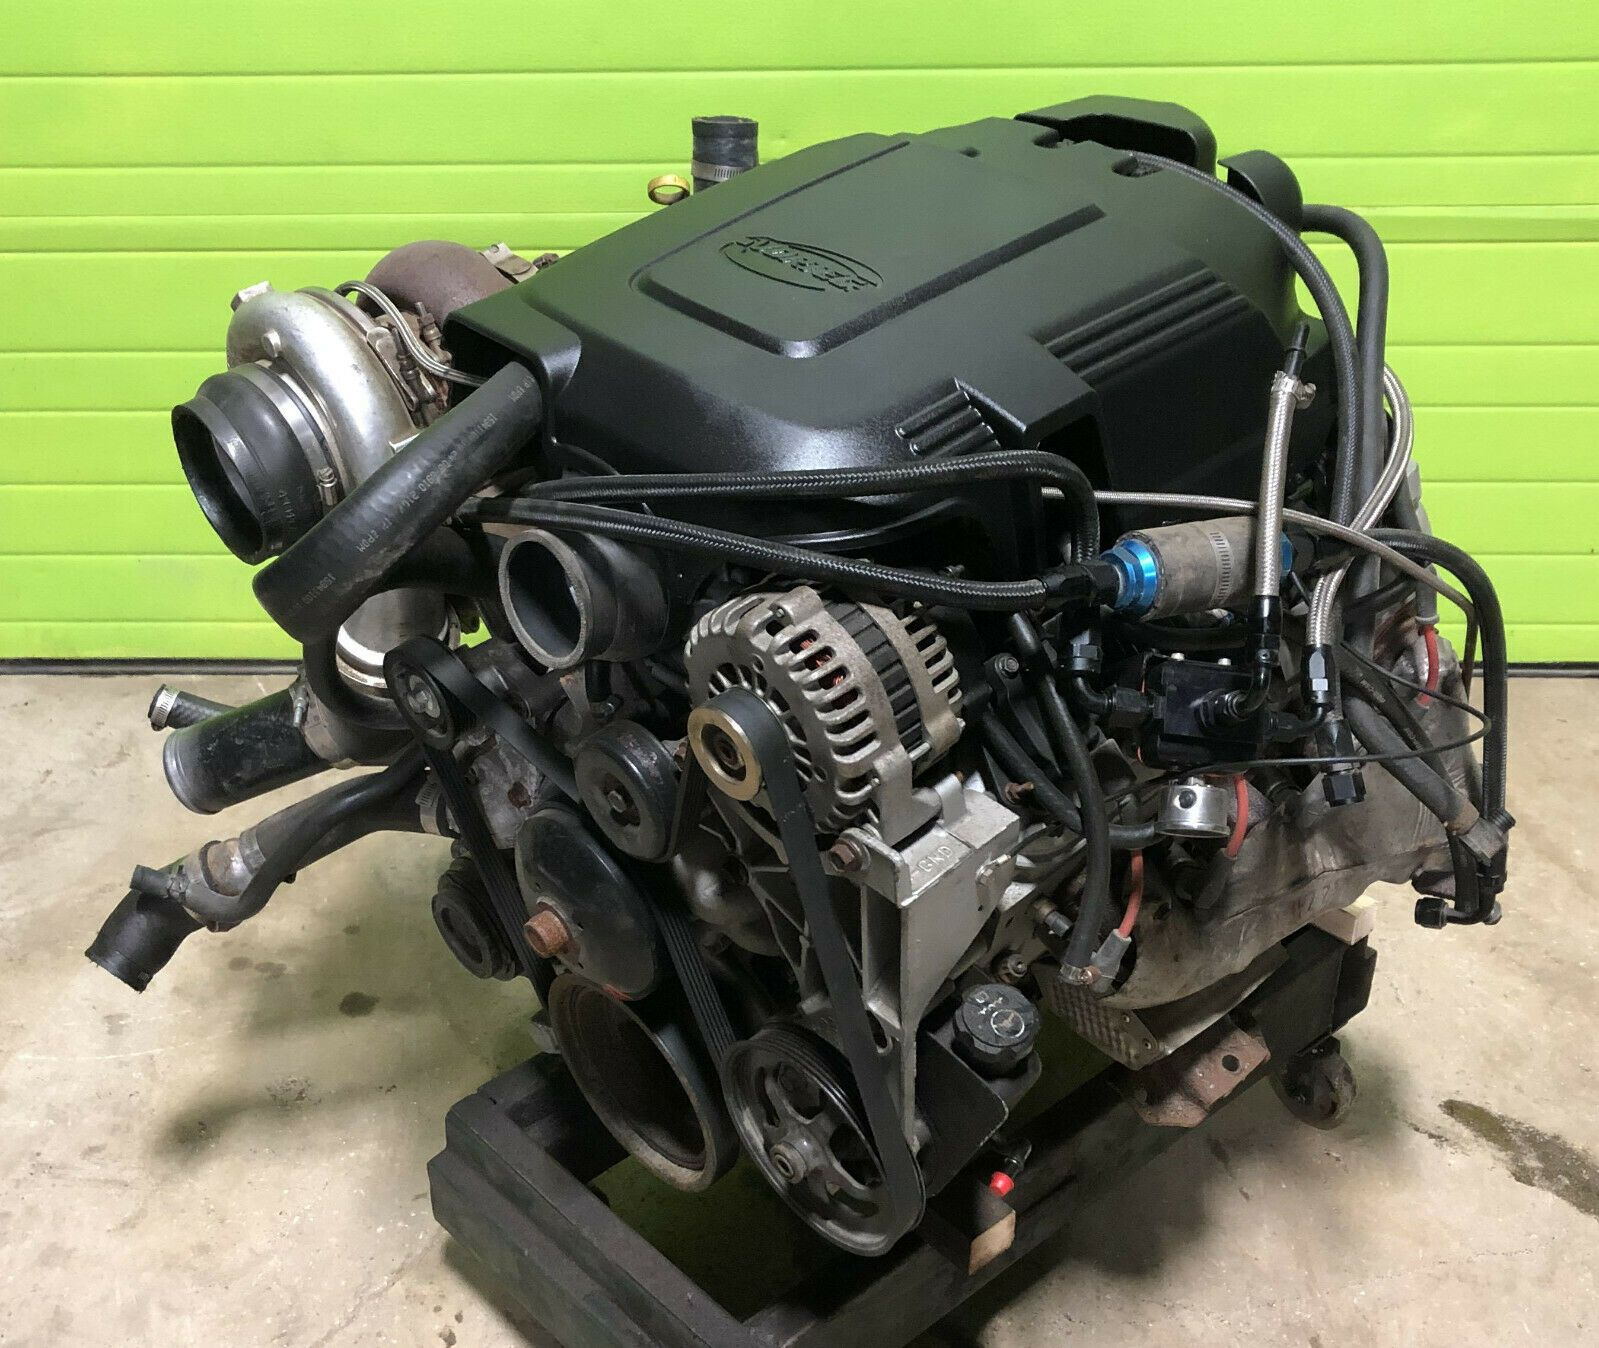 Chevy Ls Engine In 2020 Chevy Ls Chevy Ls Engine Ls Engine